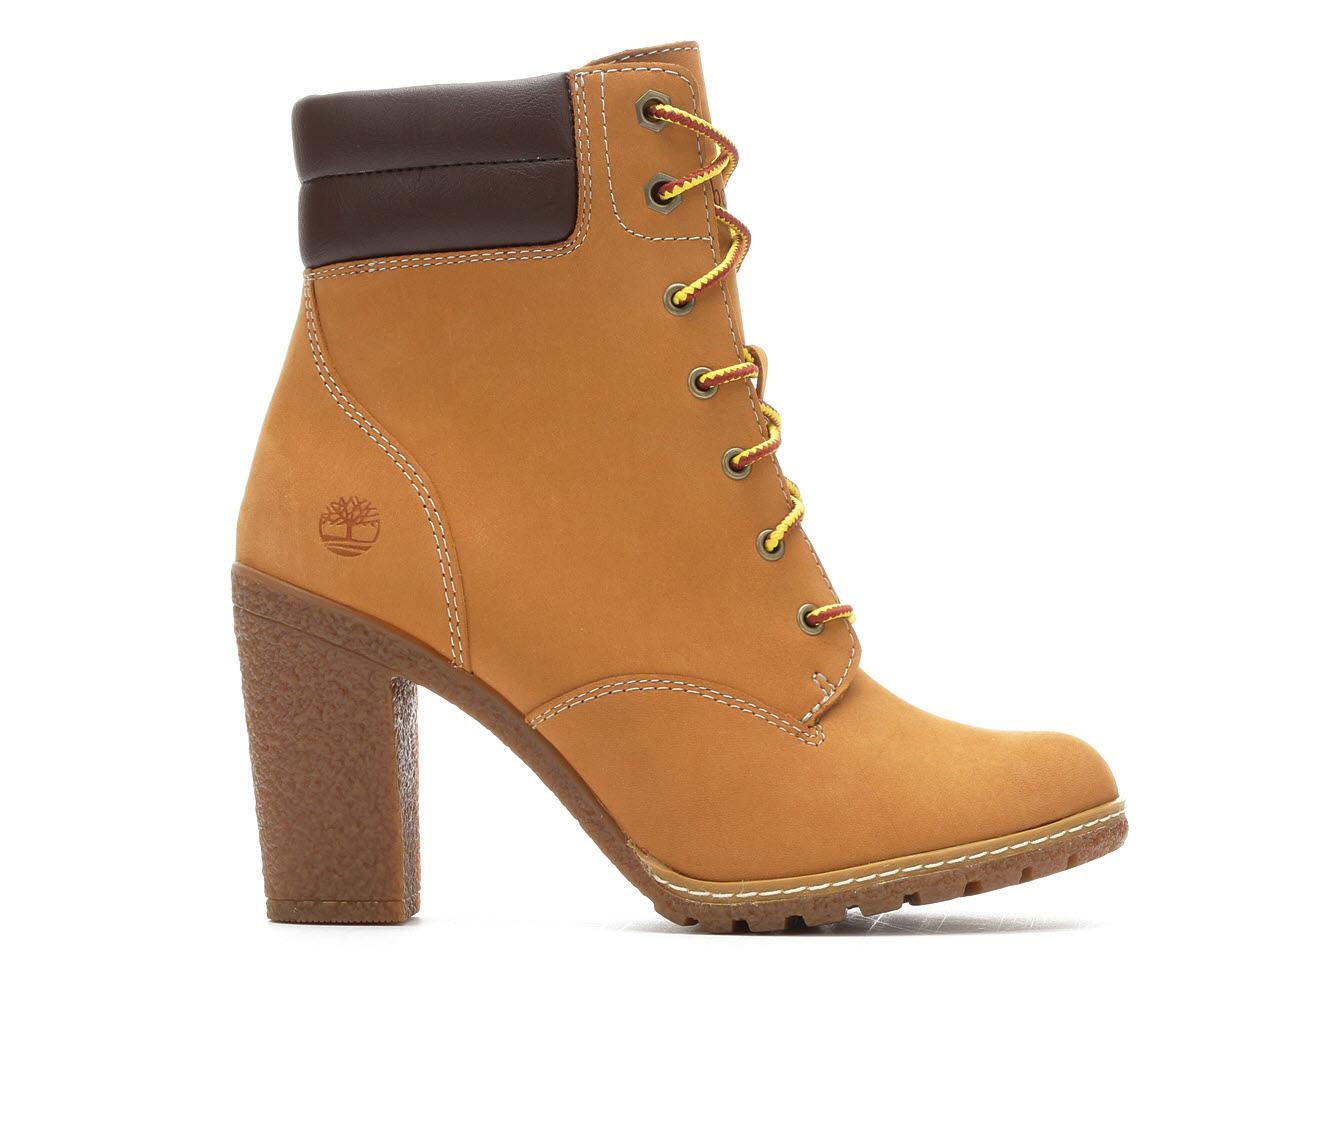 Timberland Tillston Double Collar Women's Boot (Beige Leather)